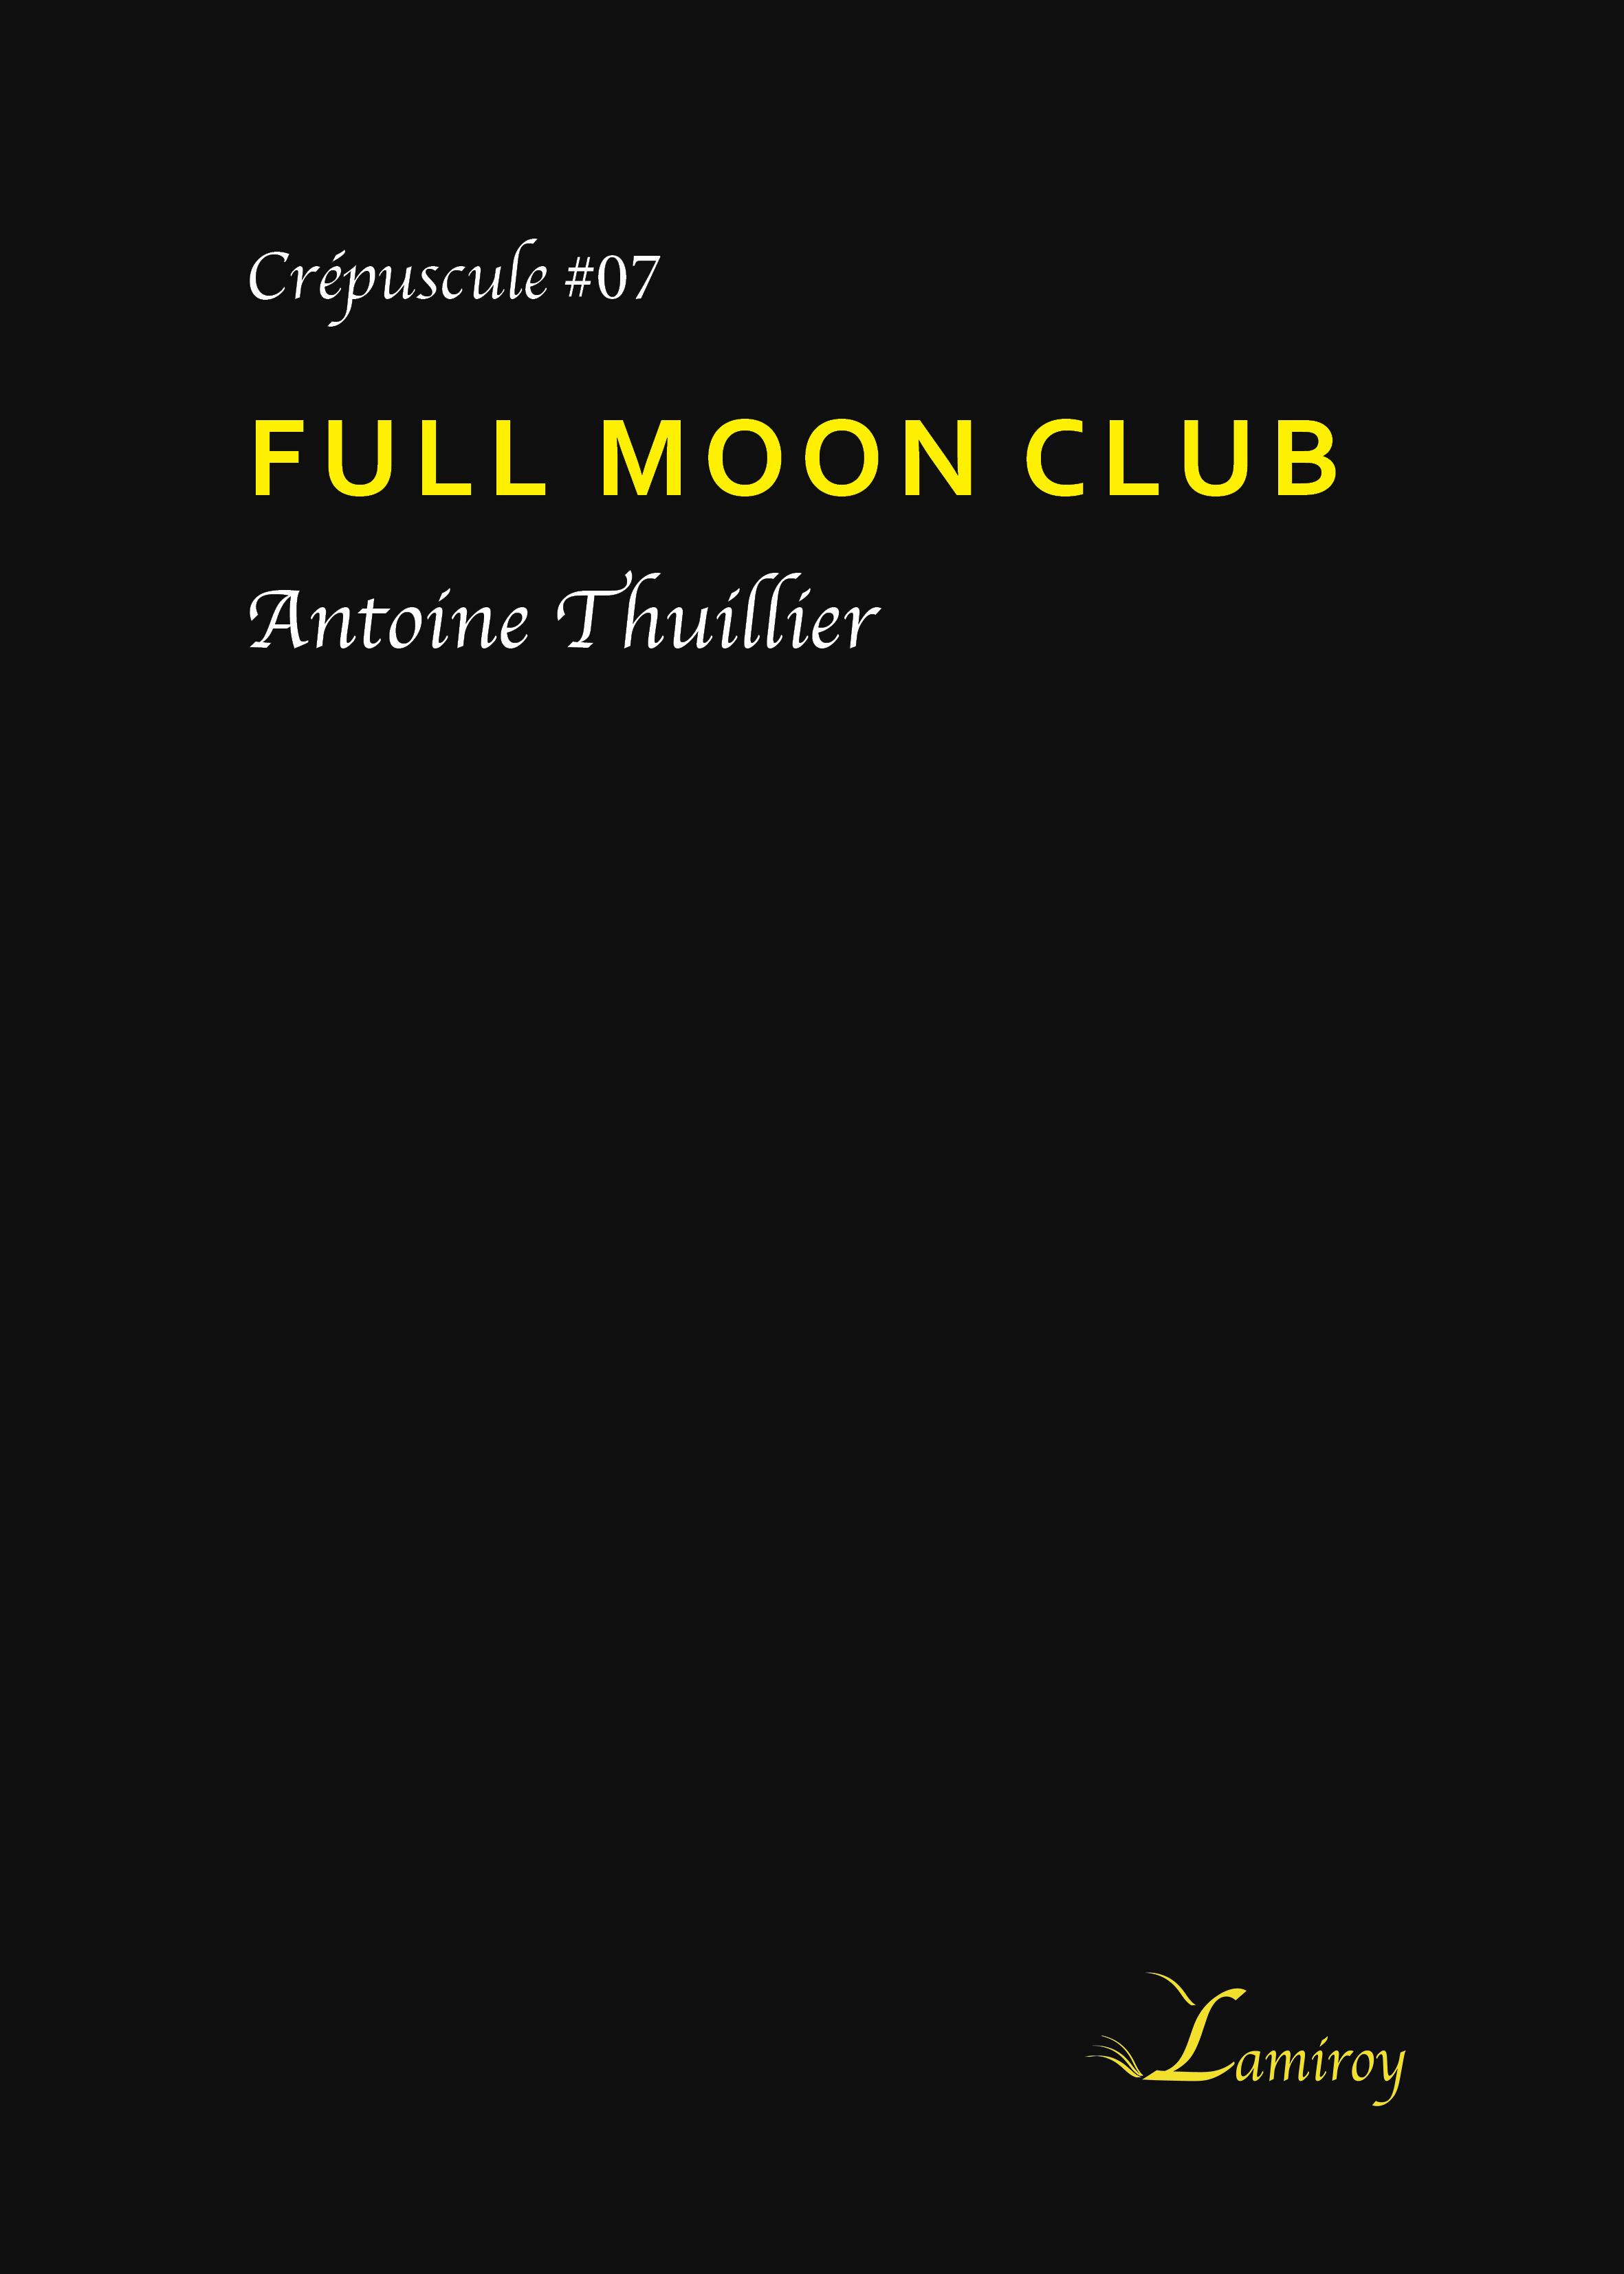 Full moon club